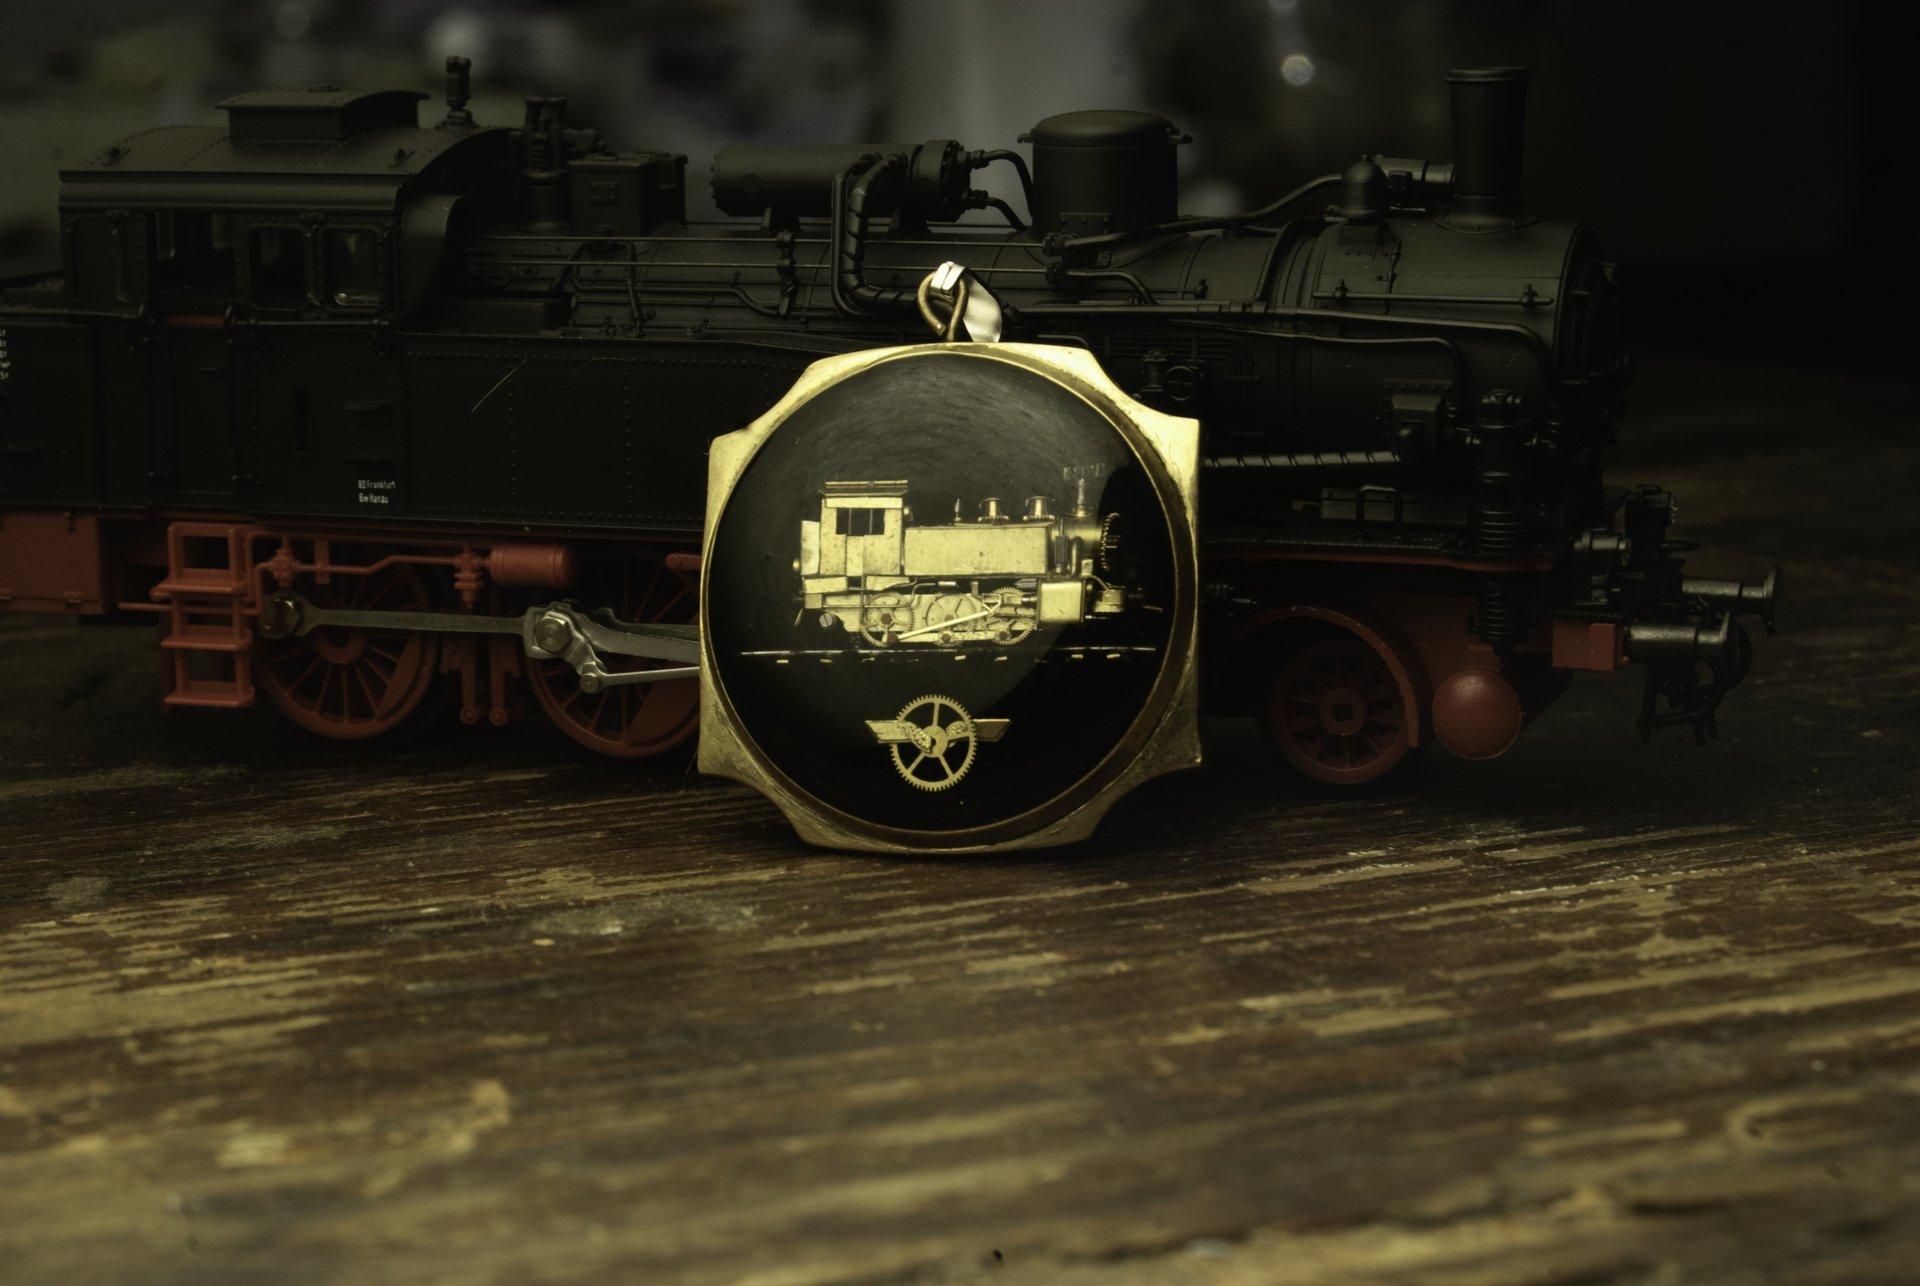 lokomotzwka.jpg